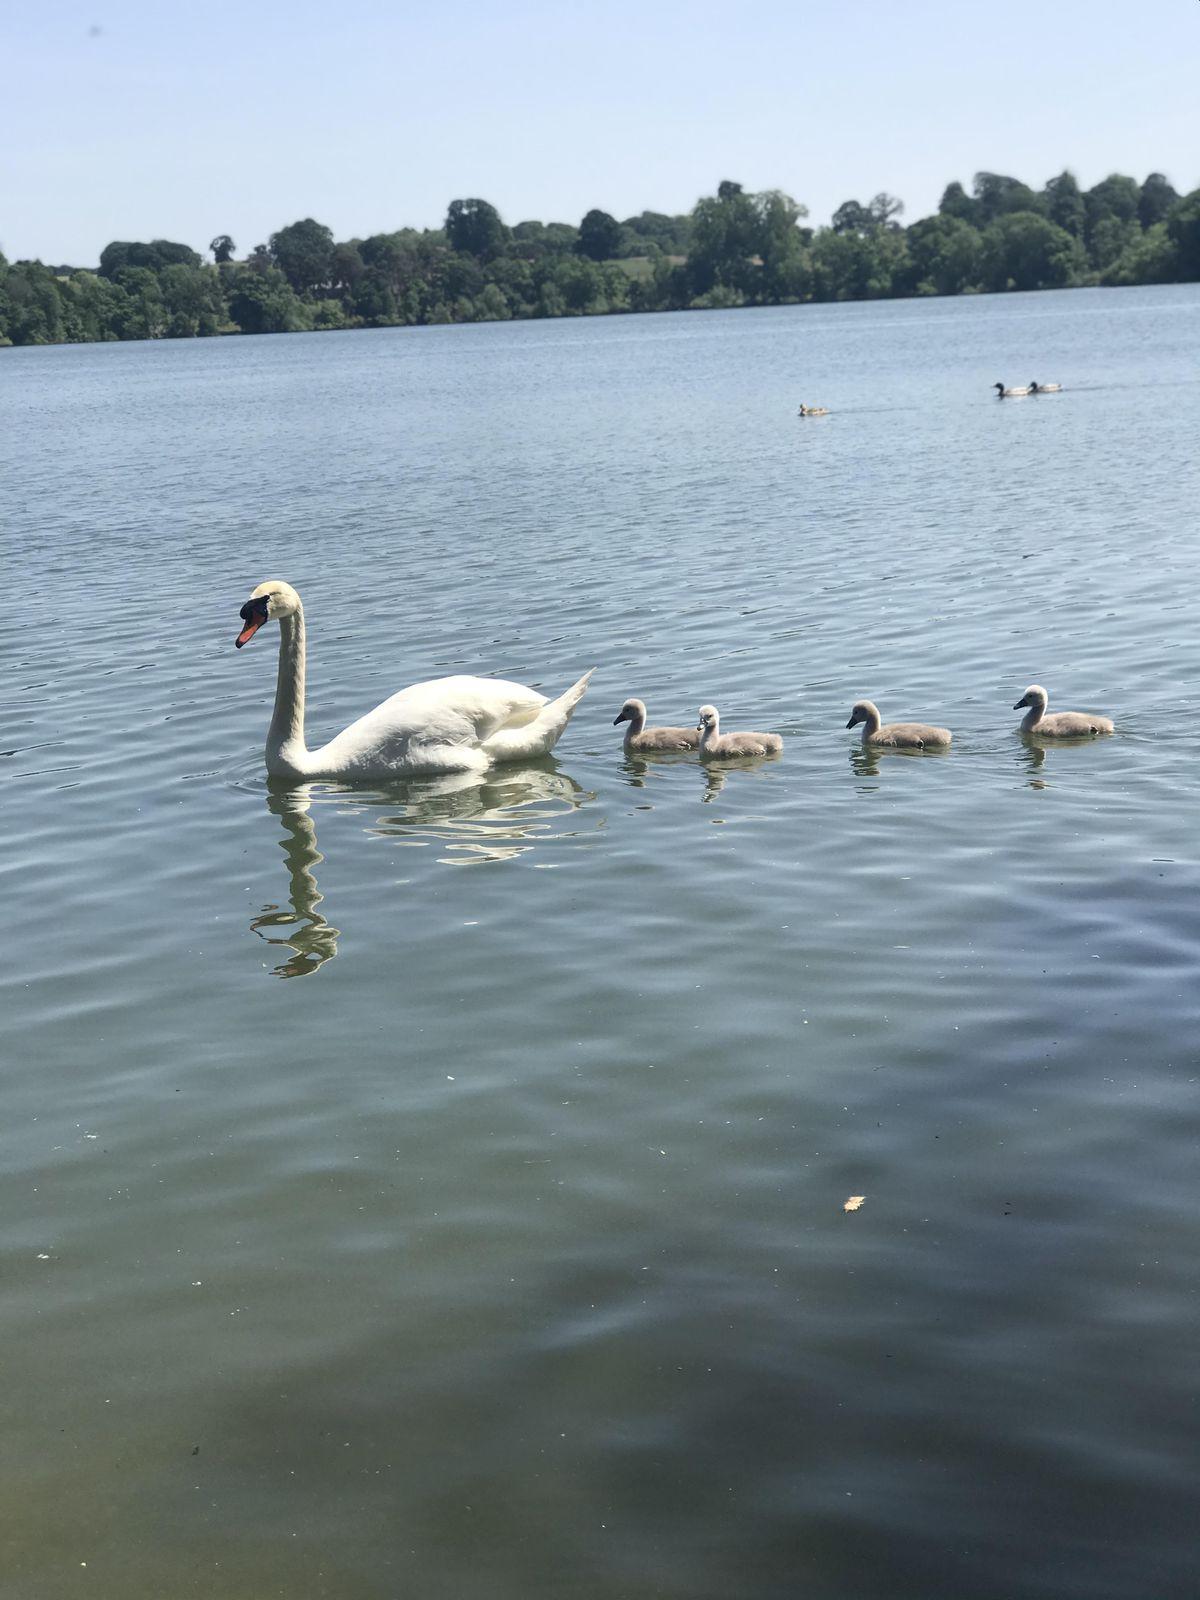 These baby swans were captured at Ellesmere Lake by Ellie Parker durng her visit